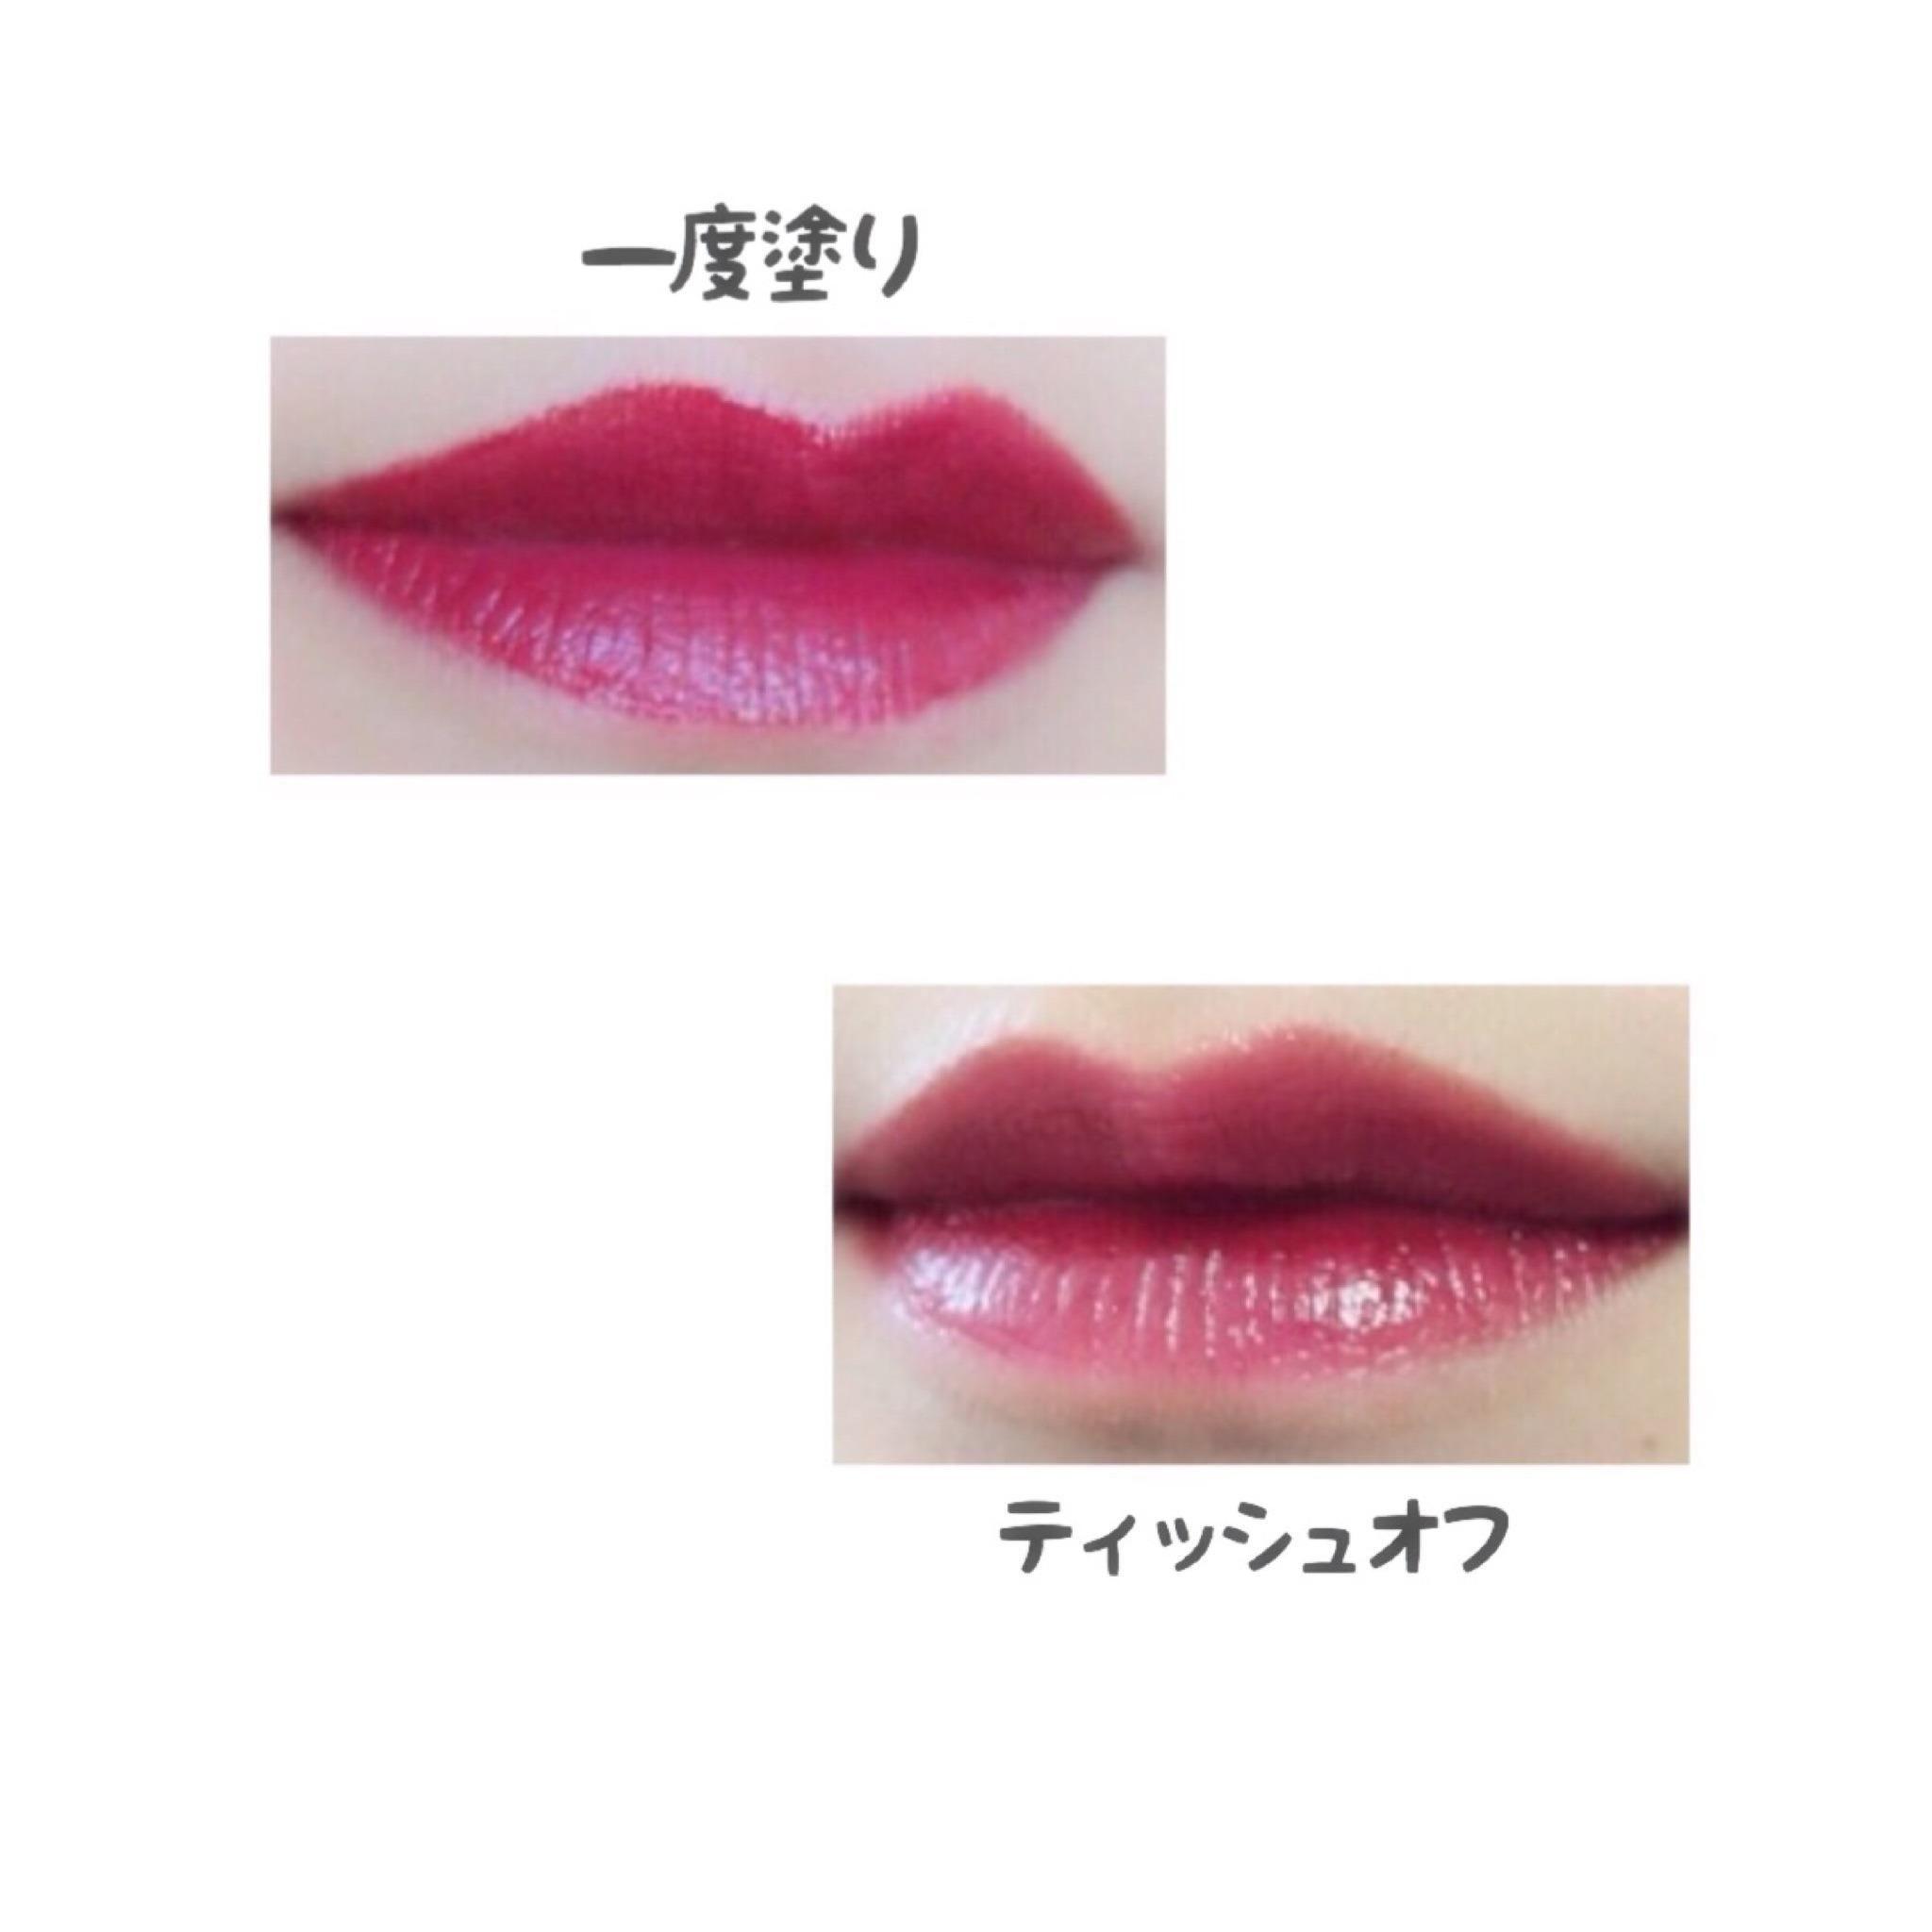 sale retailer d726b 3cb2f ディオール アディクト リップ ティント / Dior RiRi☆さんの ...